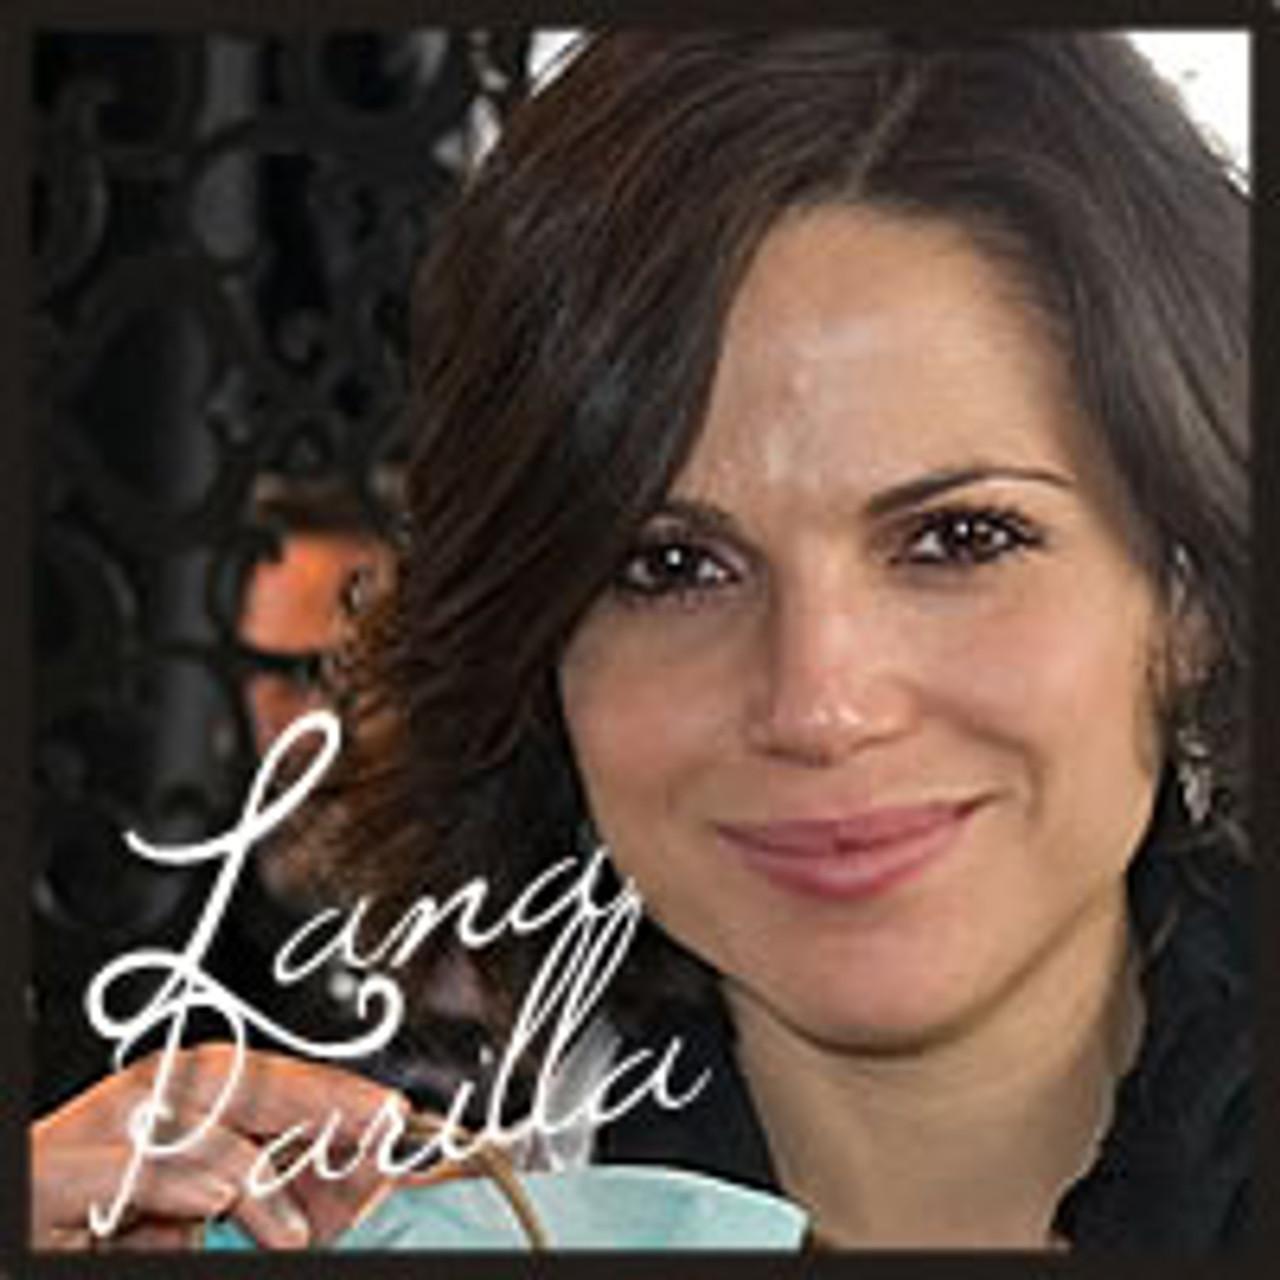 Lana Parilla